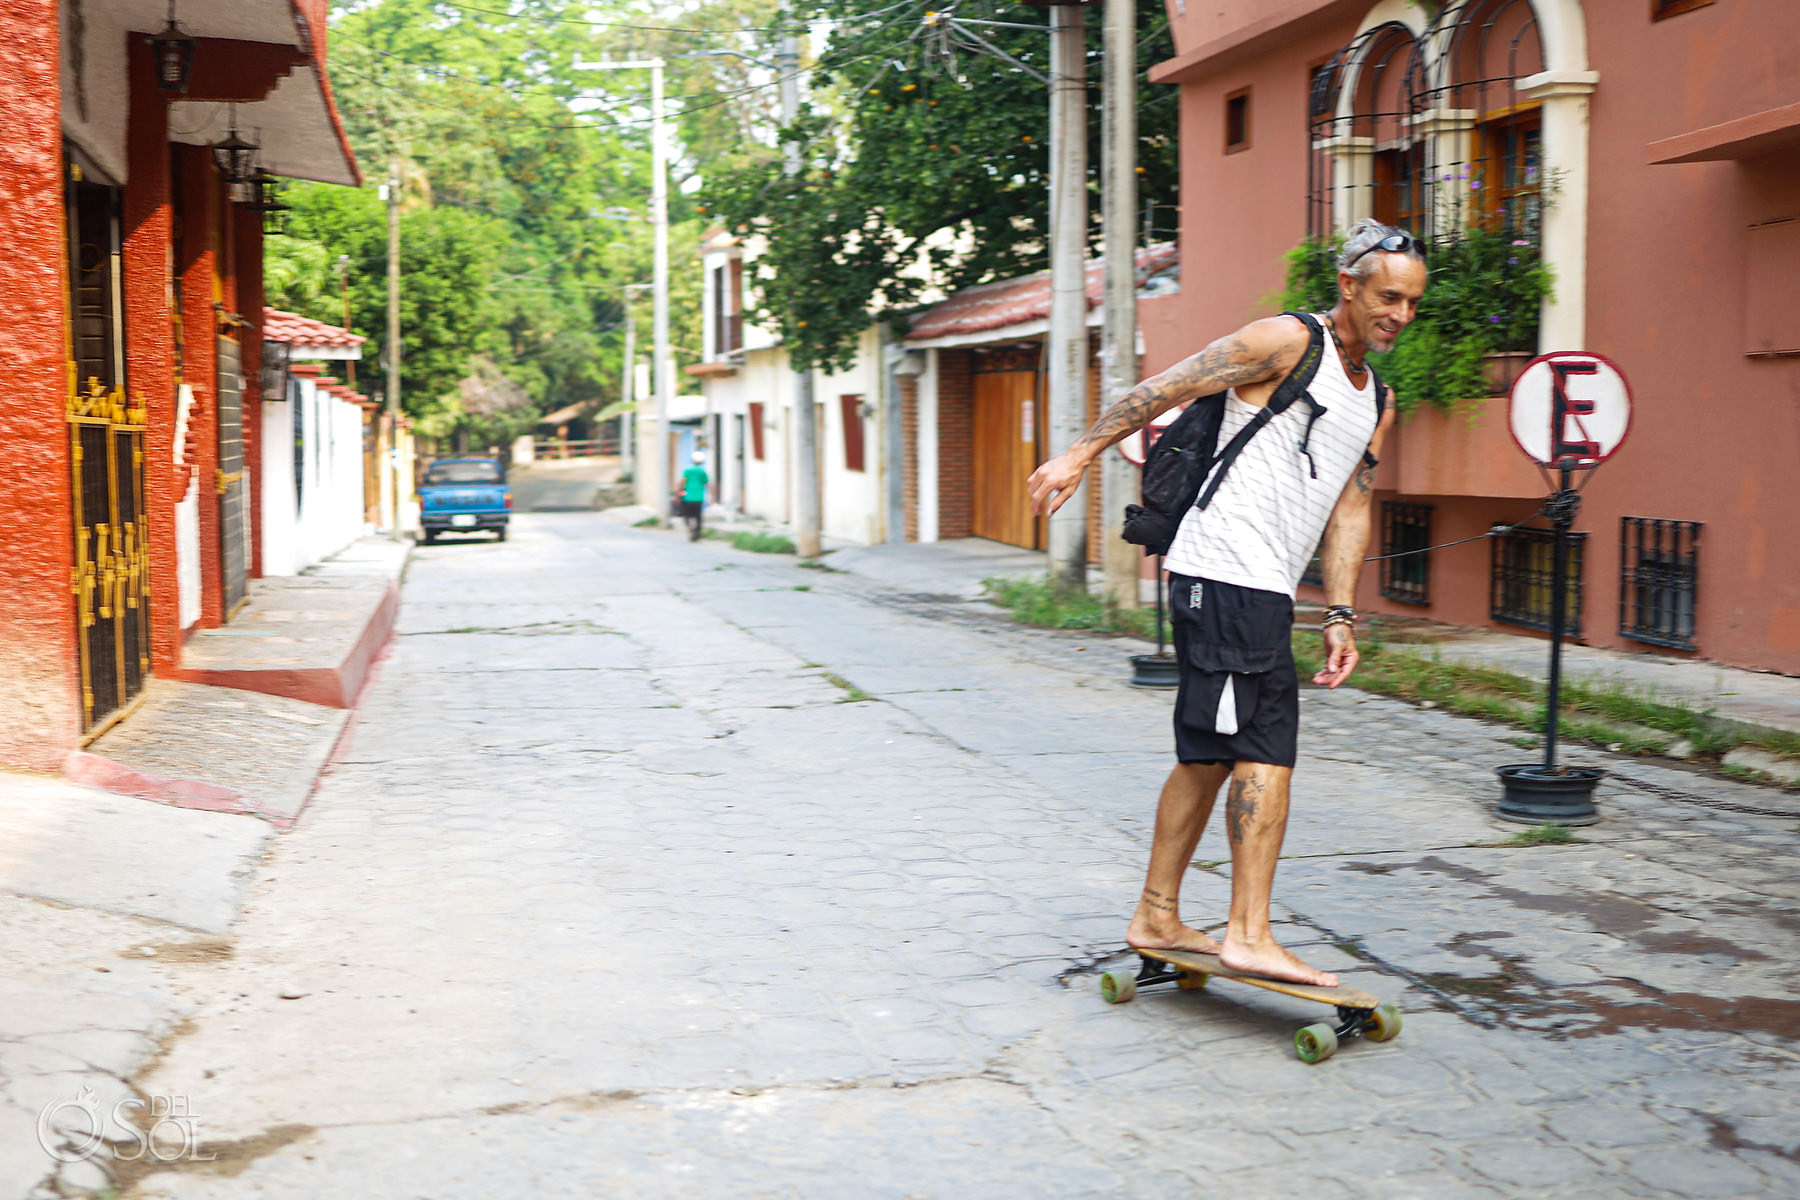 Longboard in city streets Chiapas Mexico